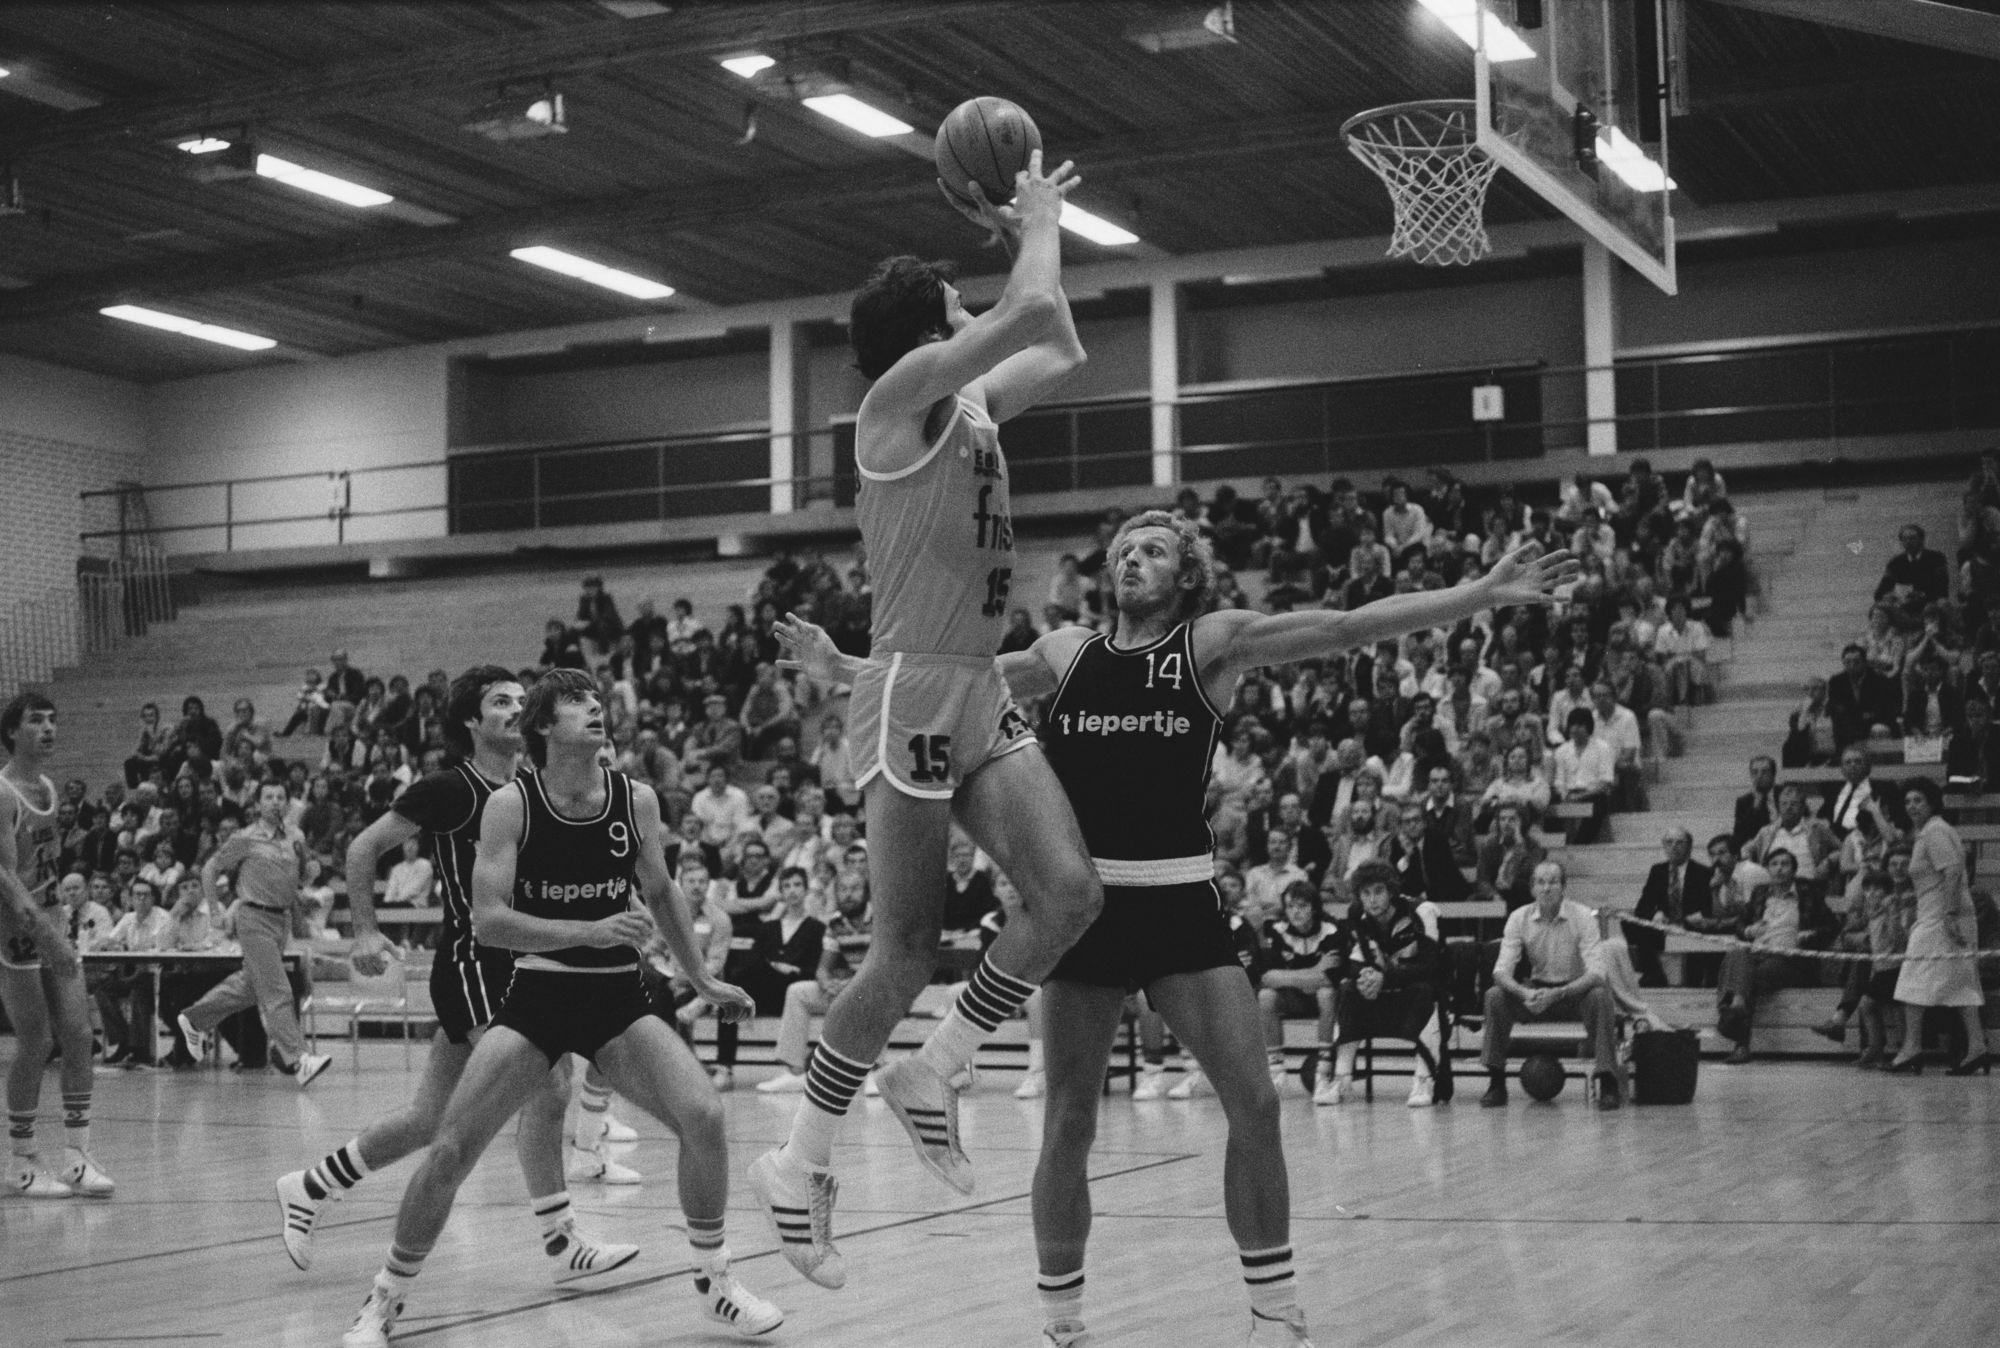 Basketbalmatch FRISA tegen 't iepertje